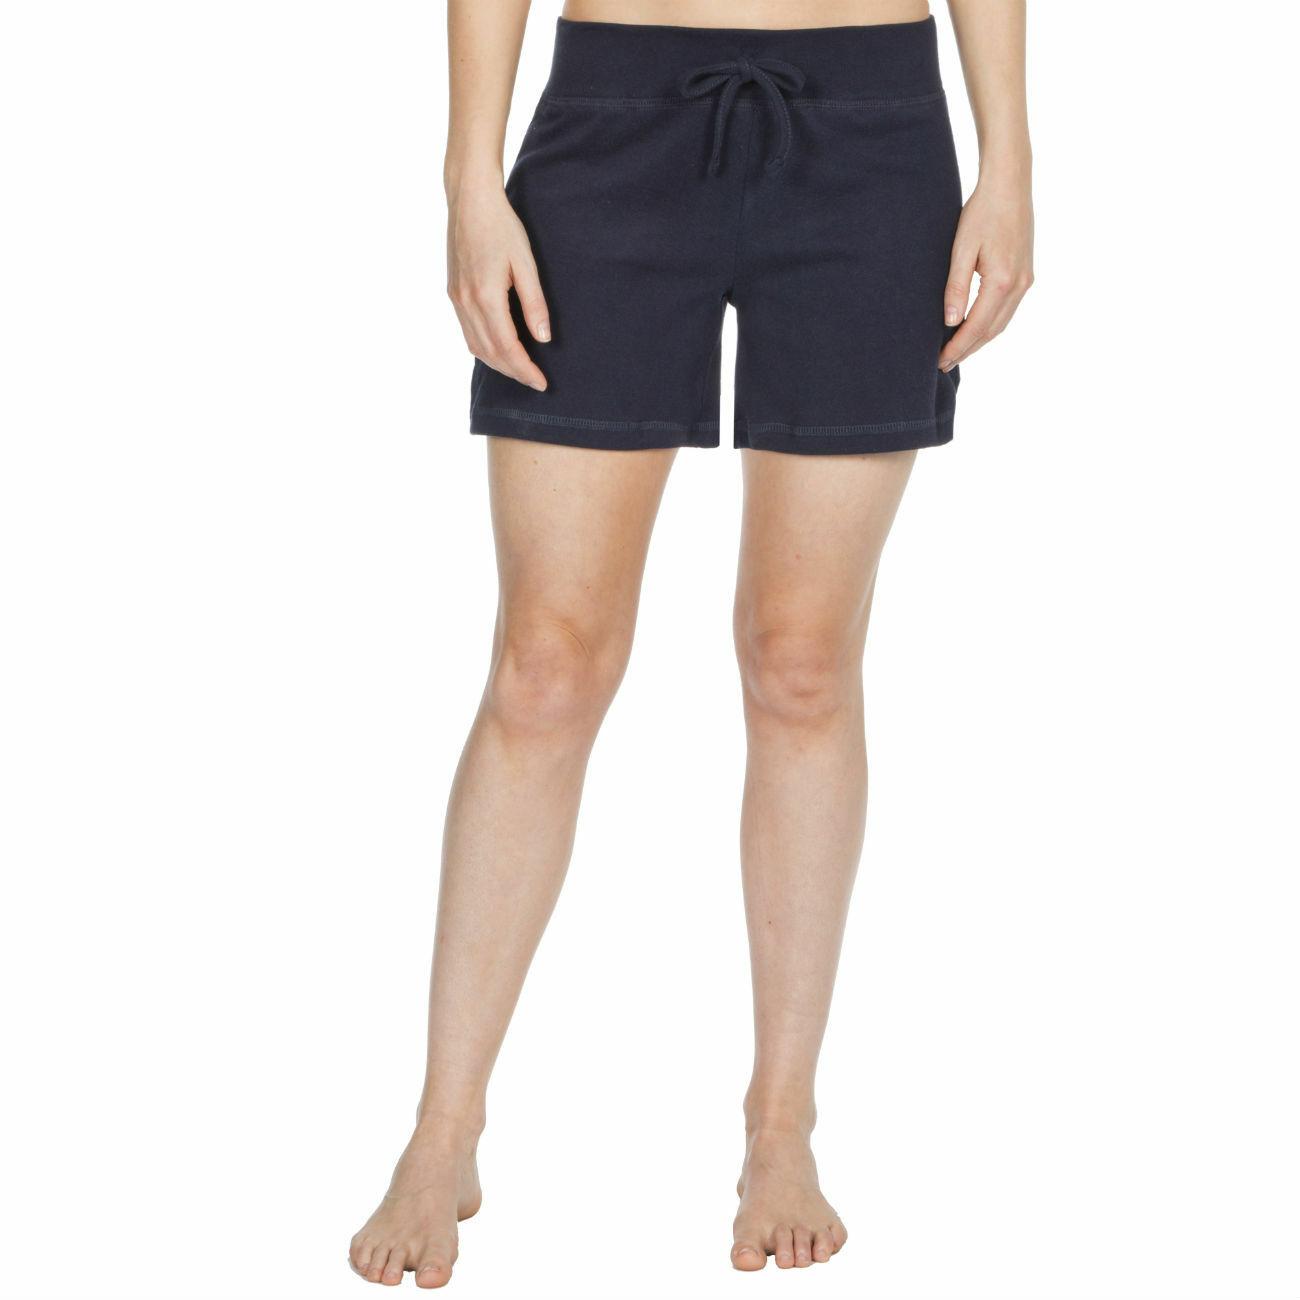 Womens-Cotton-Jersey-Shorts-Elastic-Waist-Summer-Beach-Casual-Yoga-Hot-Pants-New thumbnail 12